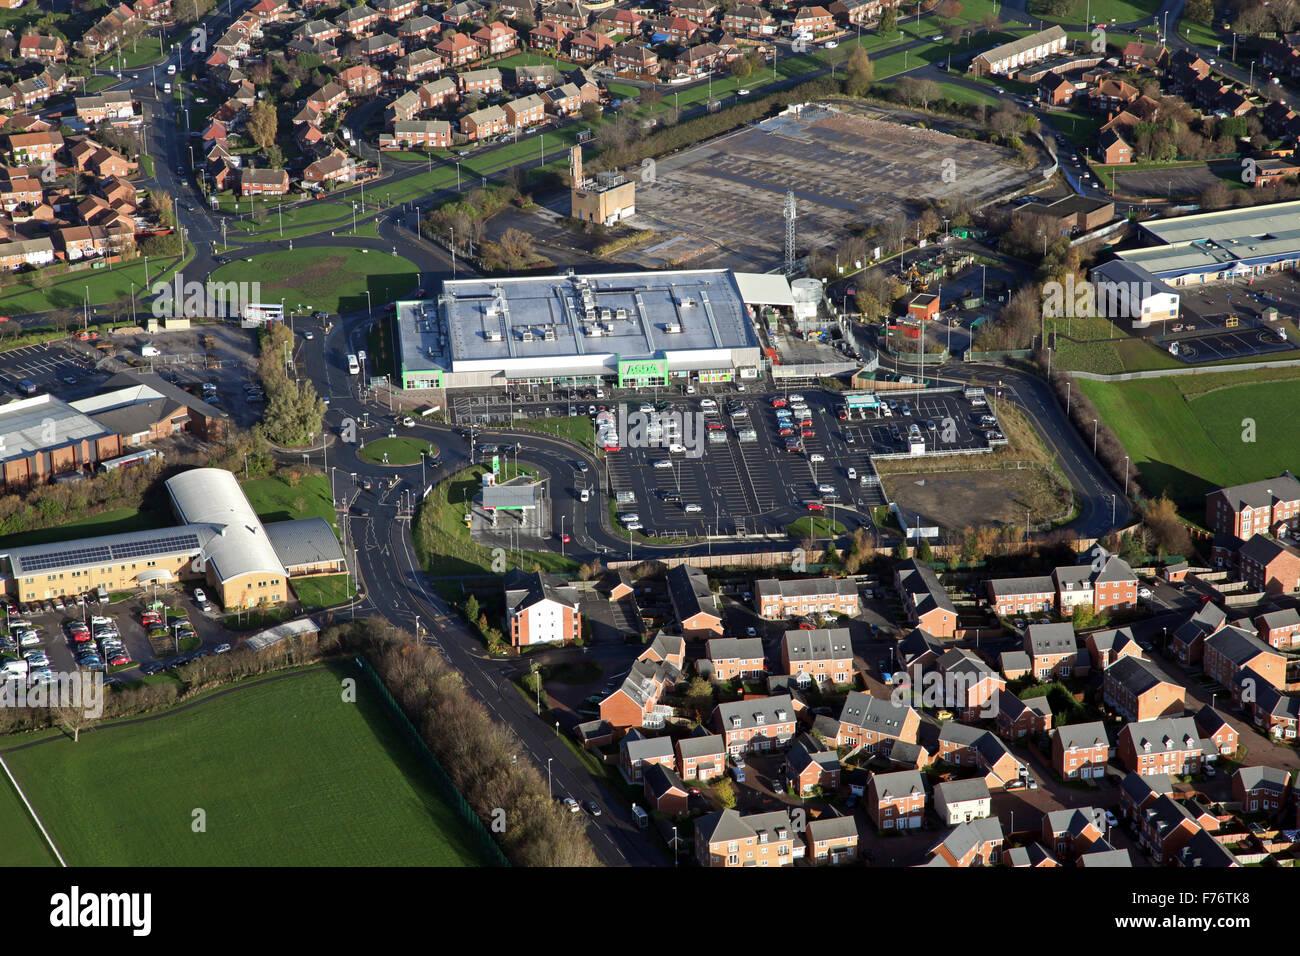 aerial view of Asda supermarket superstore at Middleton near Leeds, UK - Stock Image